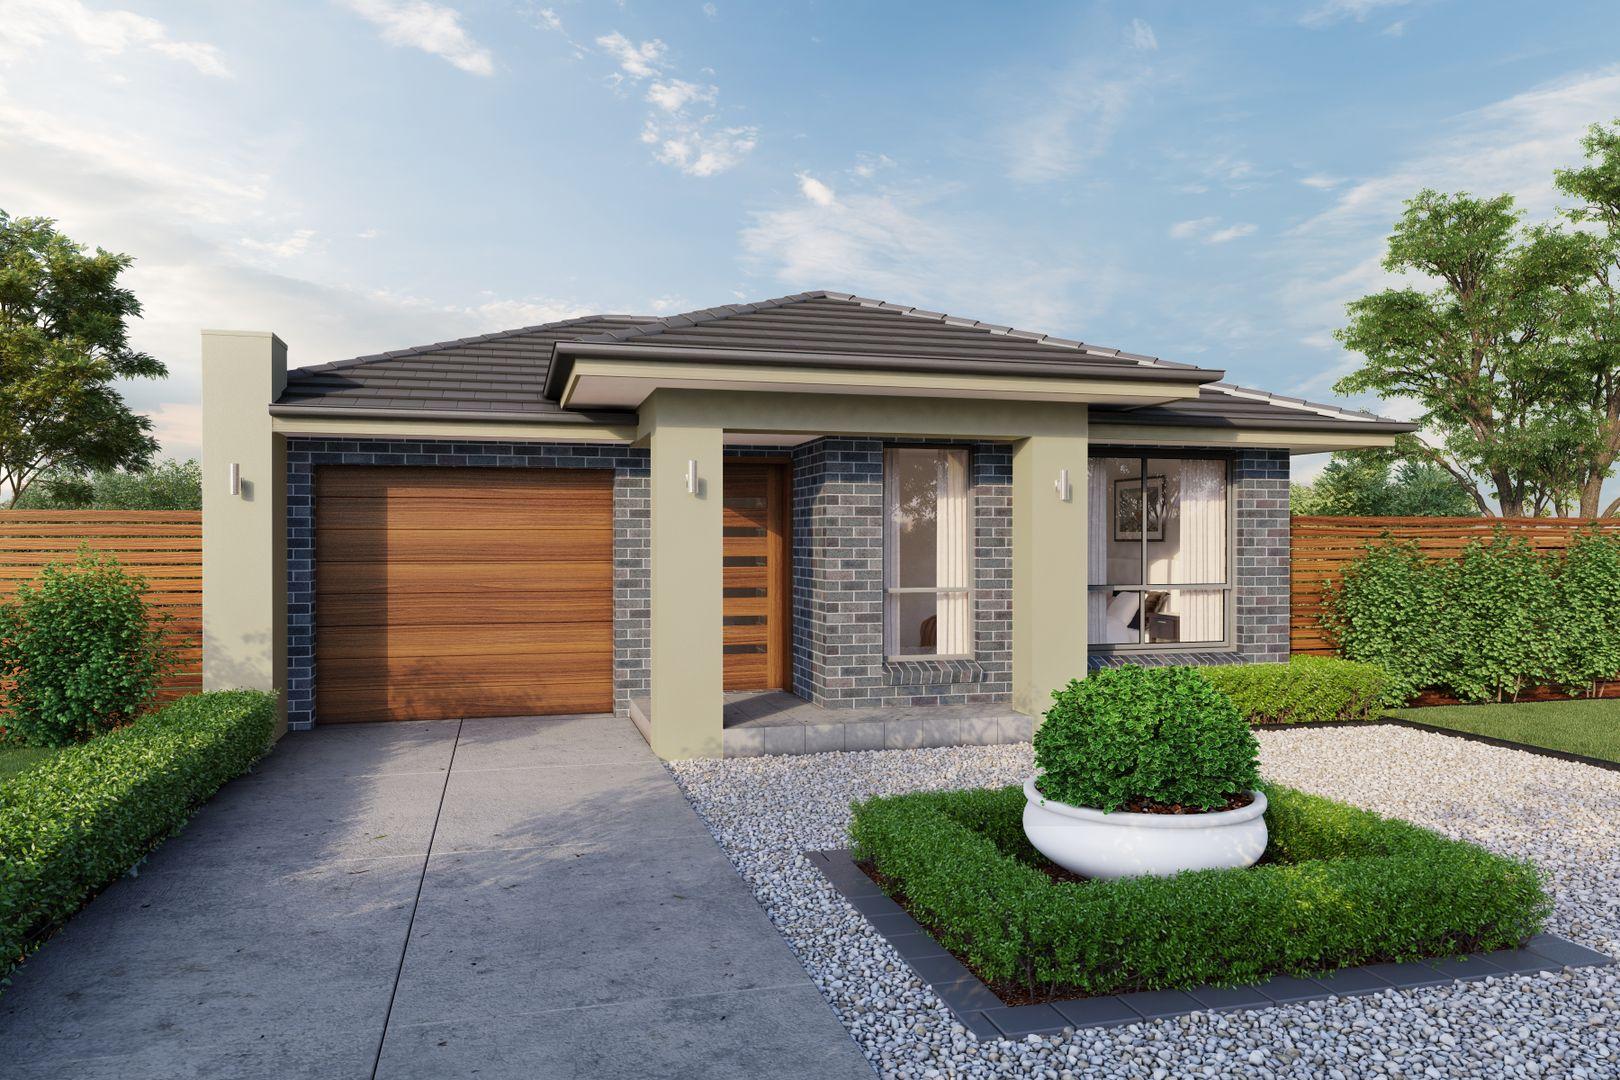 Lot 4 McIver Street, Middleton Grange NSW 2171, Image 0